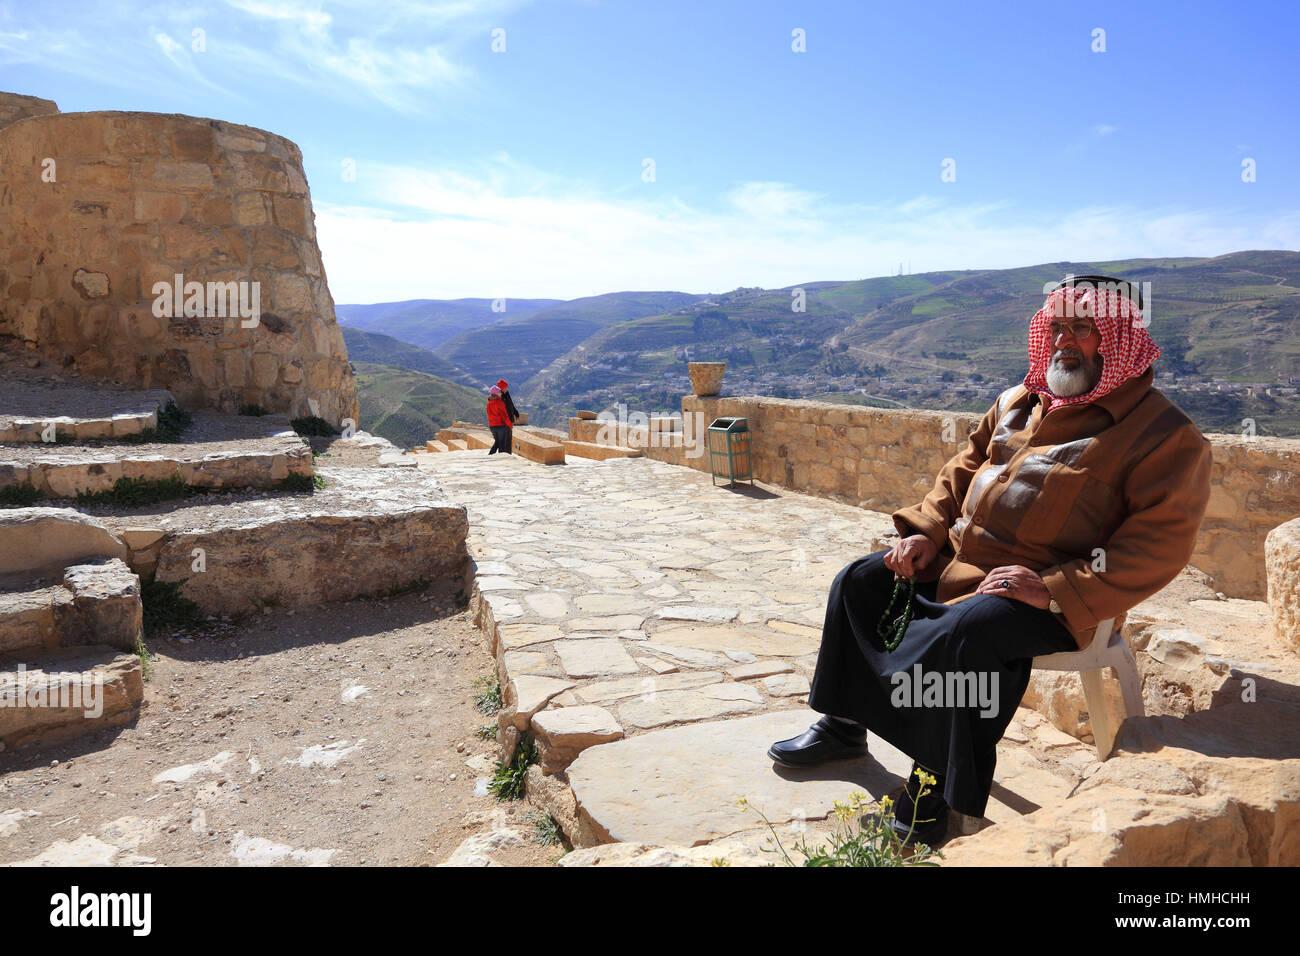 Beduin guard, Ruins of the castle of the crusaders of the Kingdom of Jerusalem, Templars castle, Kerak, Jordan Stock Photo